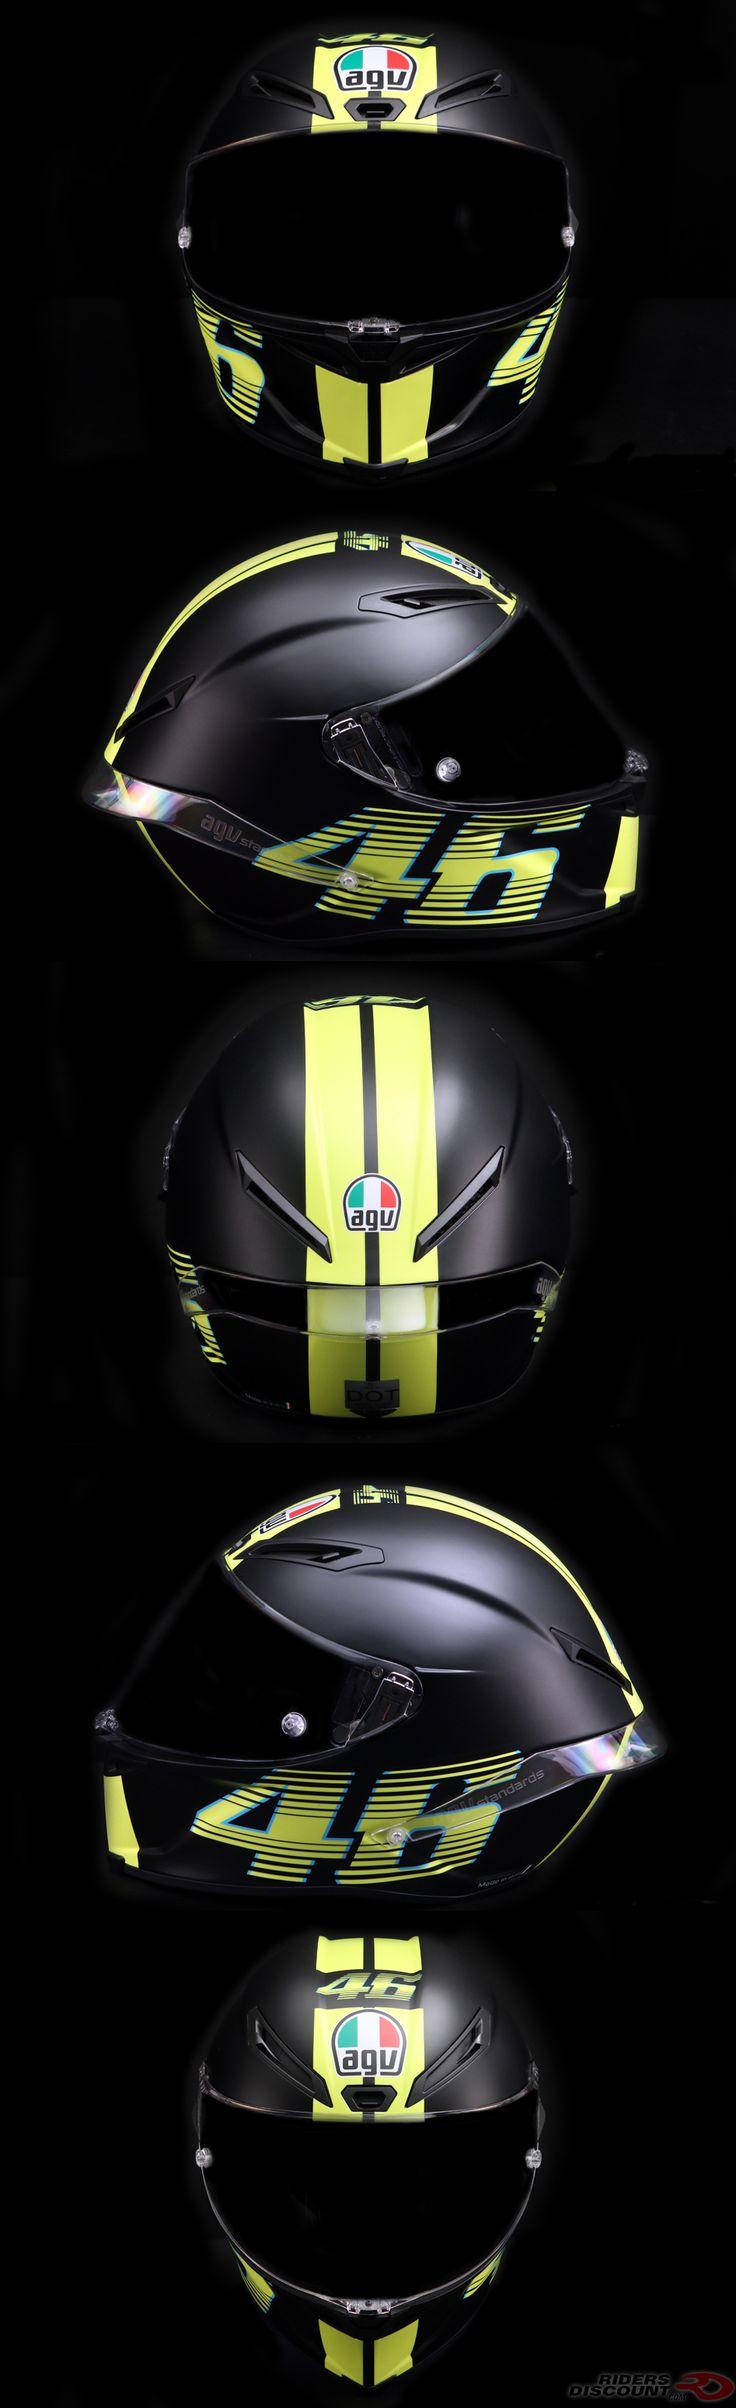 57 Best Capacetes Images On Pinterest Motorcycle Helmet New Arai Vector X Hutchinson Tt Helm Full Face Black Red Agv Corsa R Valentino Rossi V46